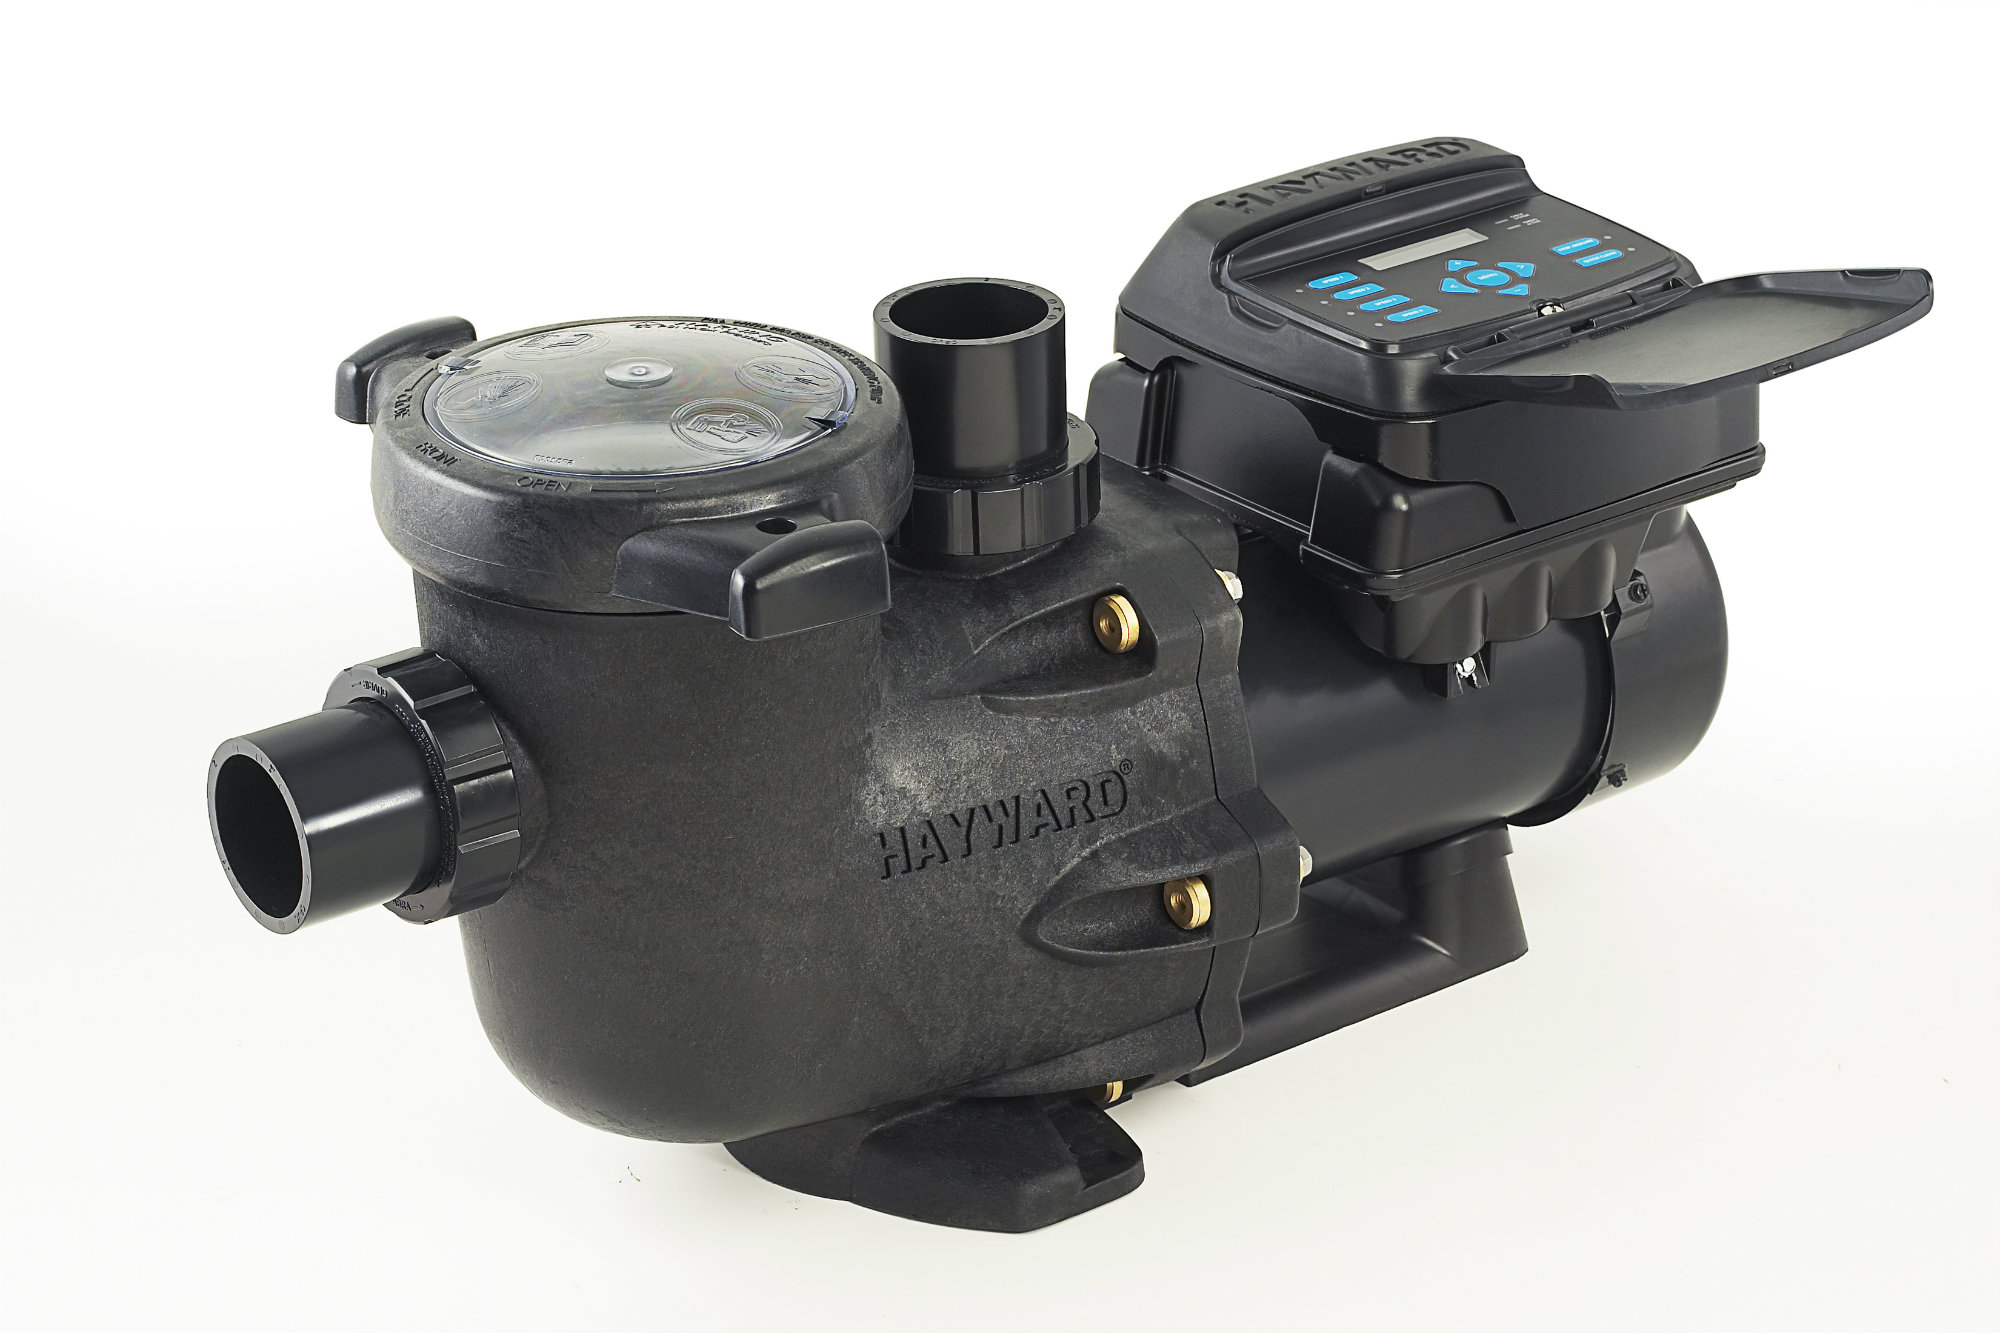 Hayward Introduces Its Newest Variable Speed Pump Pool